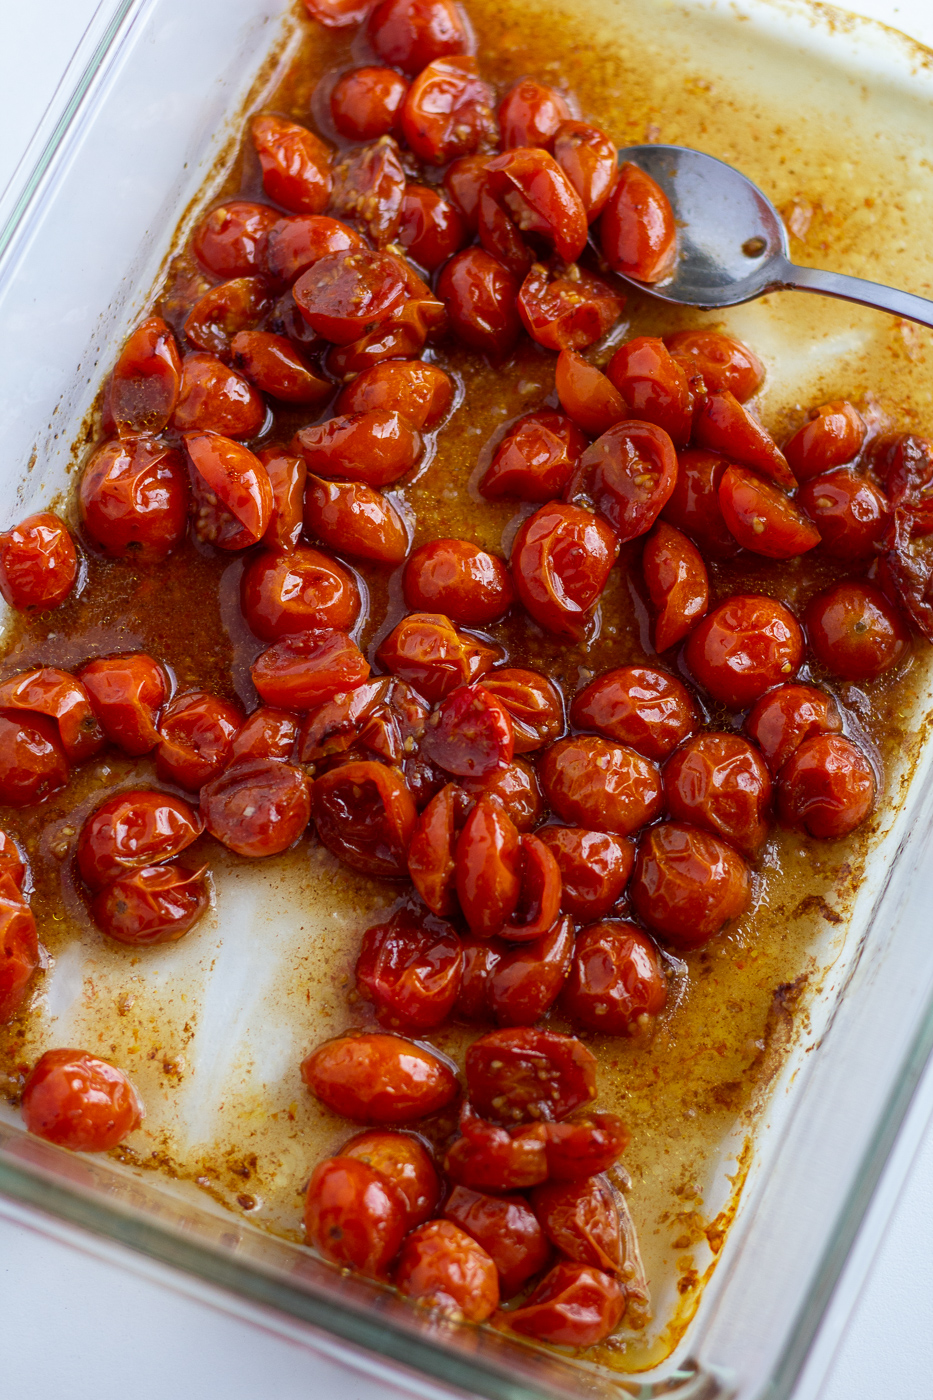 Balsamic Roasted Cherry Tomatoes